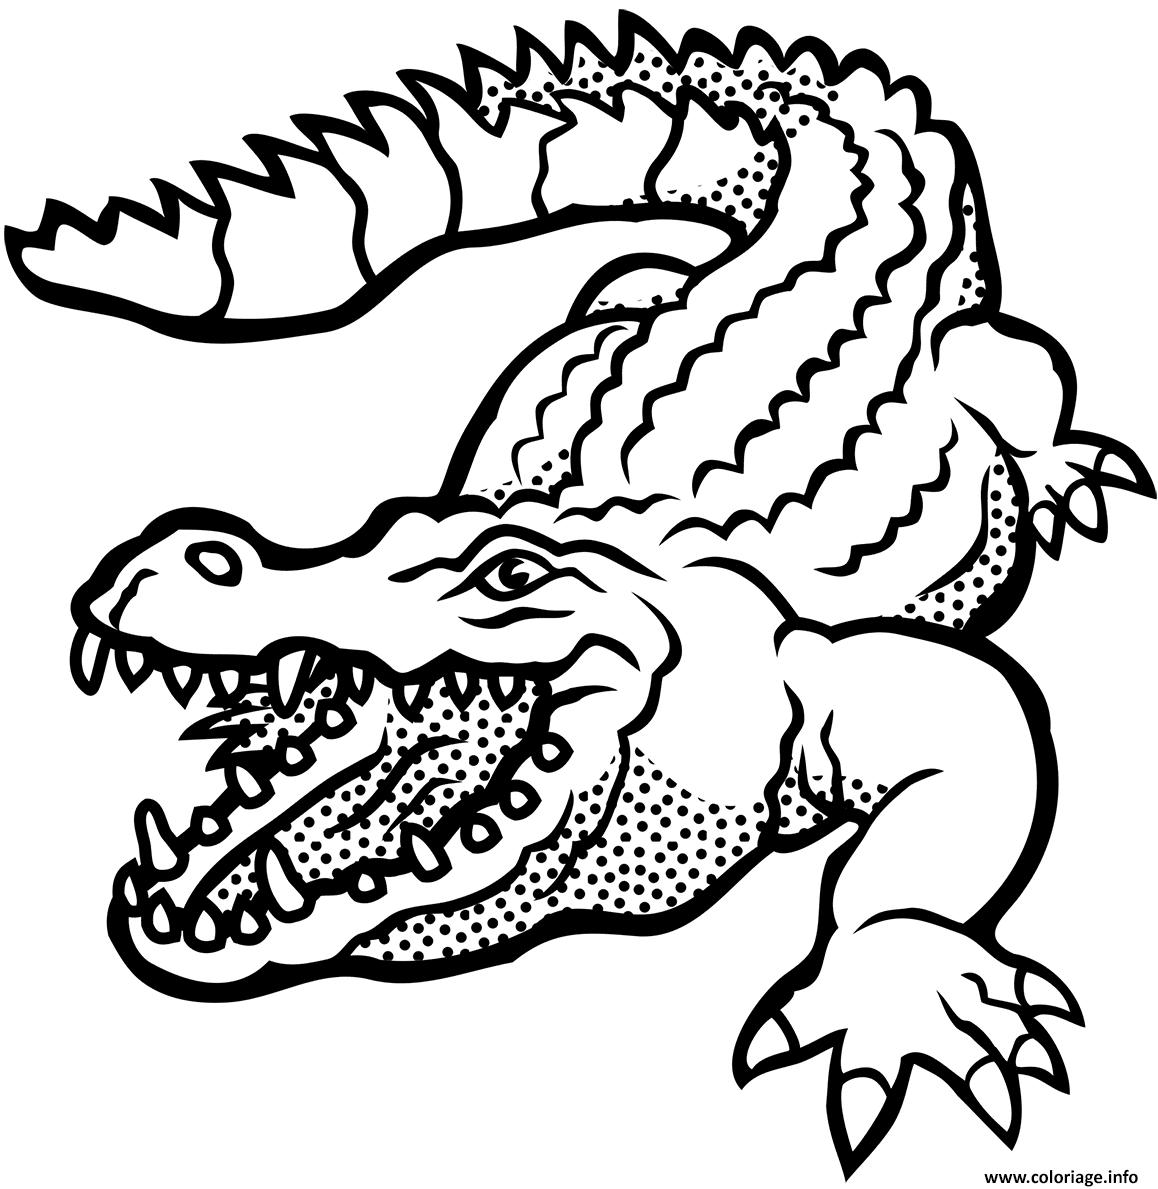 Dessin crocodile americain vitesse 29 kmh Coloriage Gratuit à Imprimer